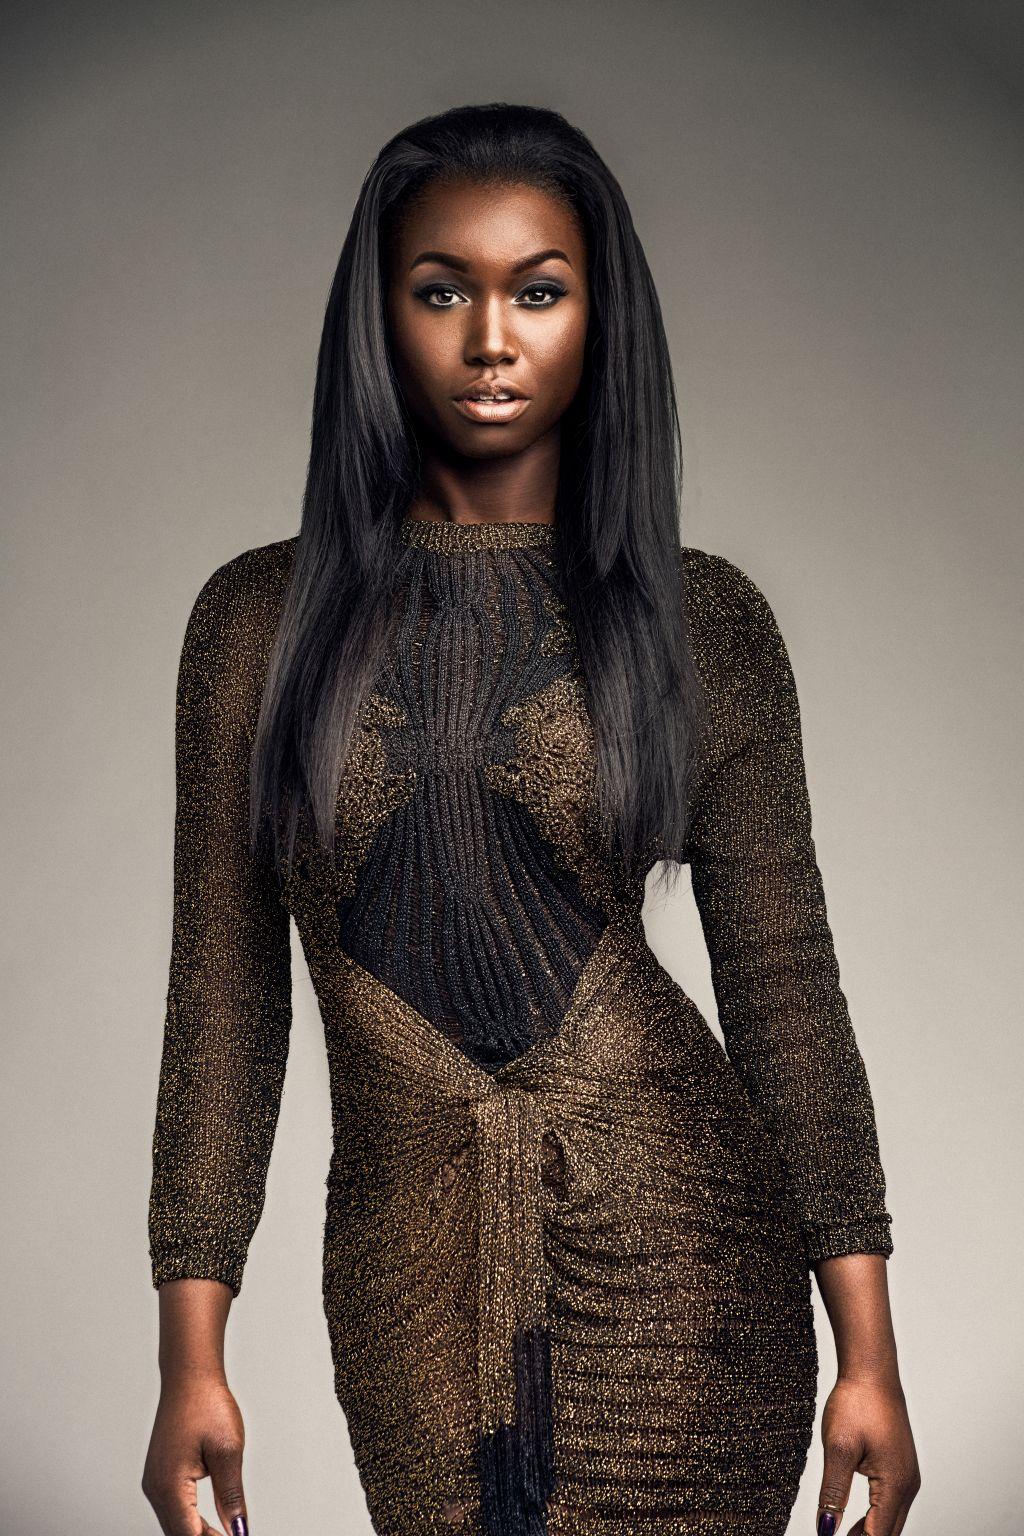 Nana Afua Antwi for FabAfrique Magazine - BellaNaija - January 2016 (2)